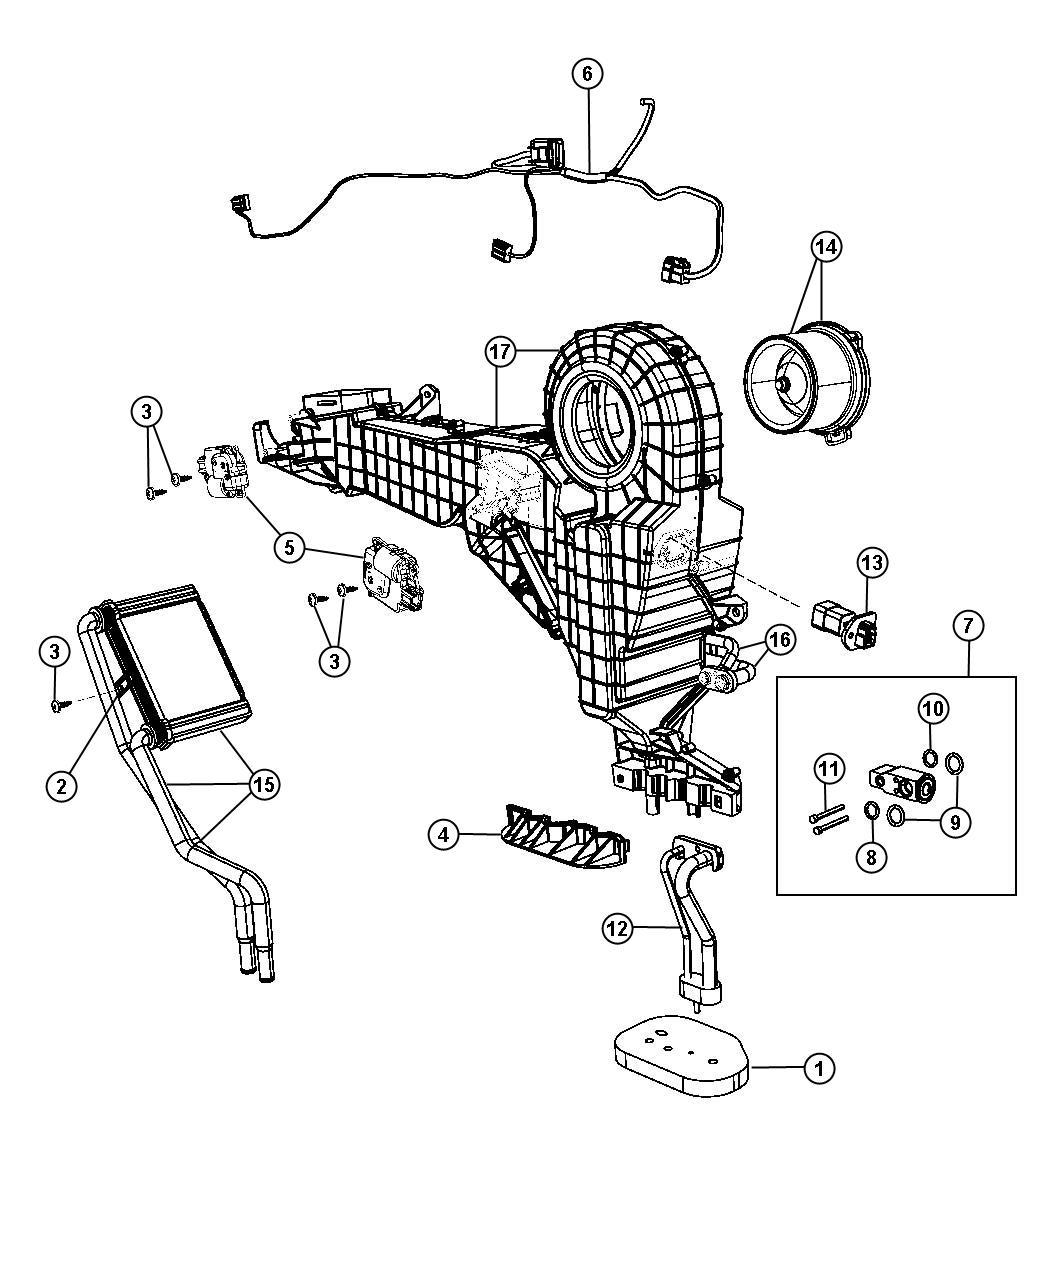 Dodge Durango Resistor Blower Motor After 1 3 08 Up To